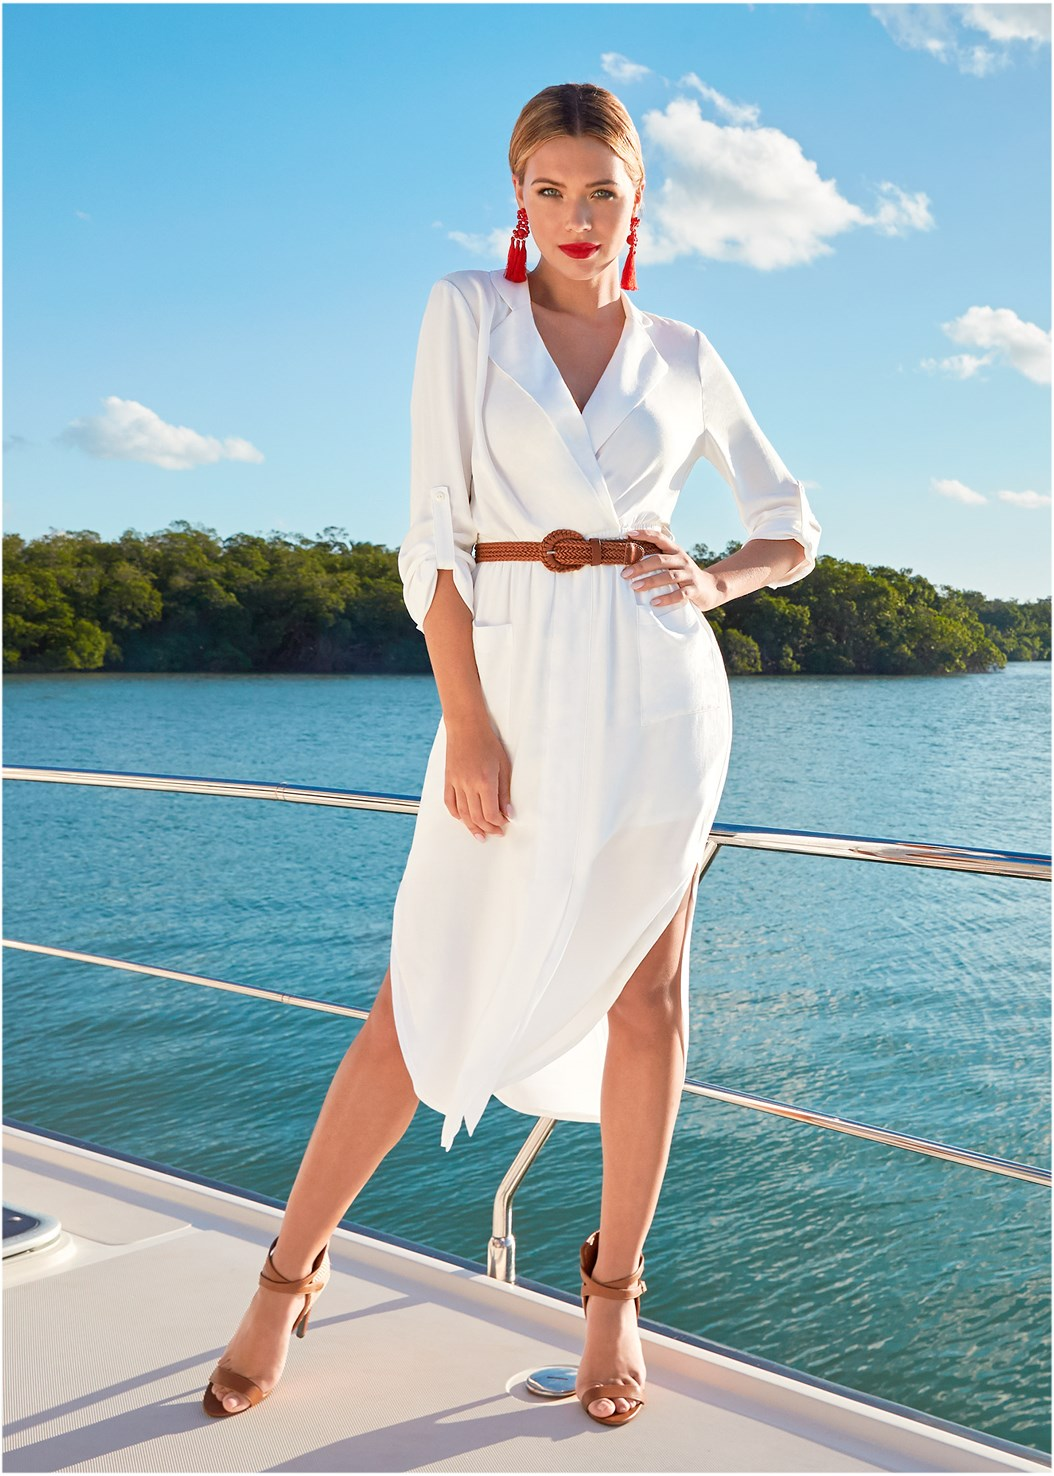 Belted Midi Shirt Dress,Cupid U Plunge Bra,Raffia Detail Heels,Tassel Earrings